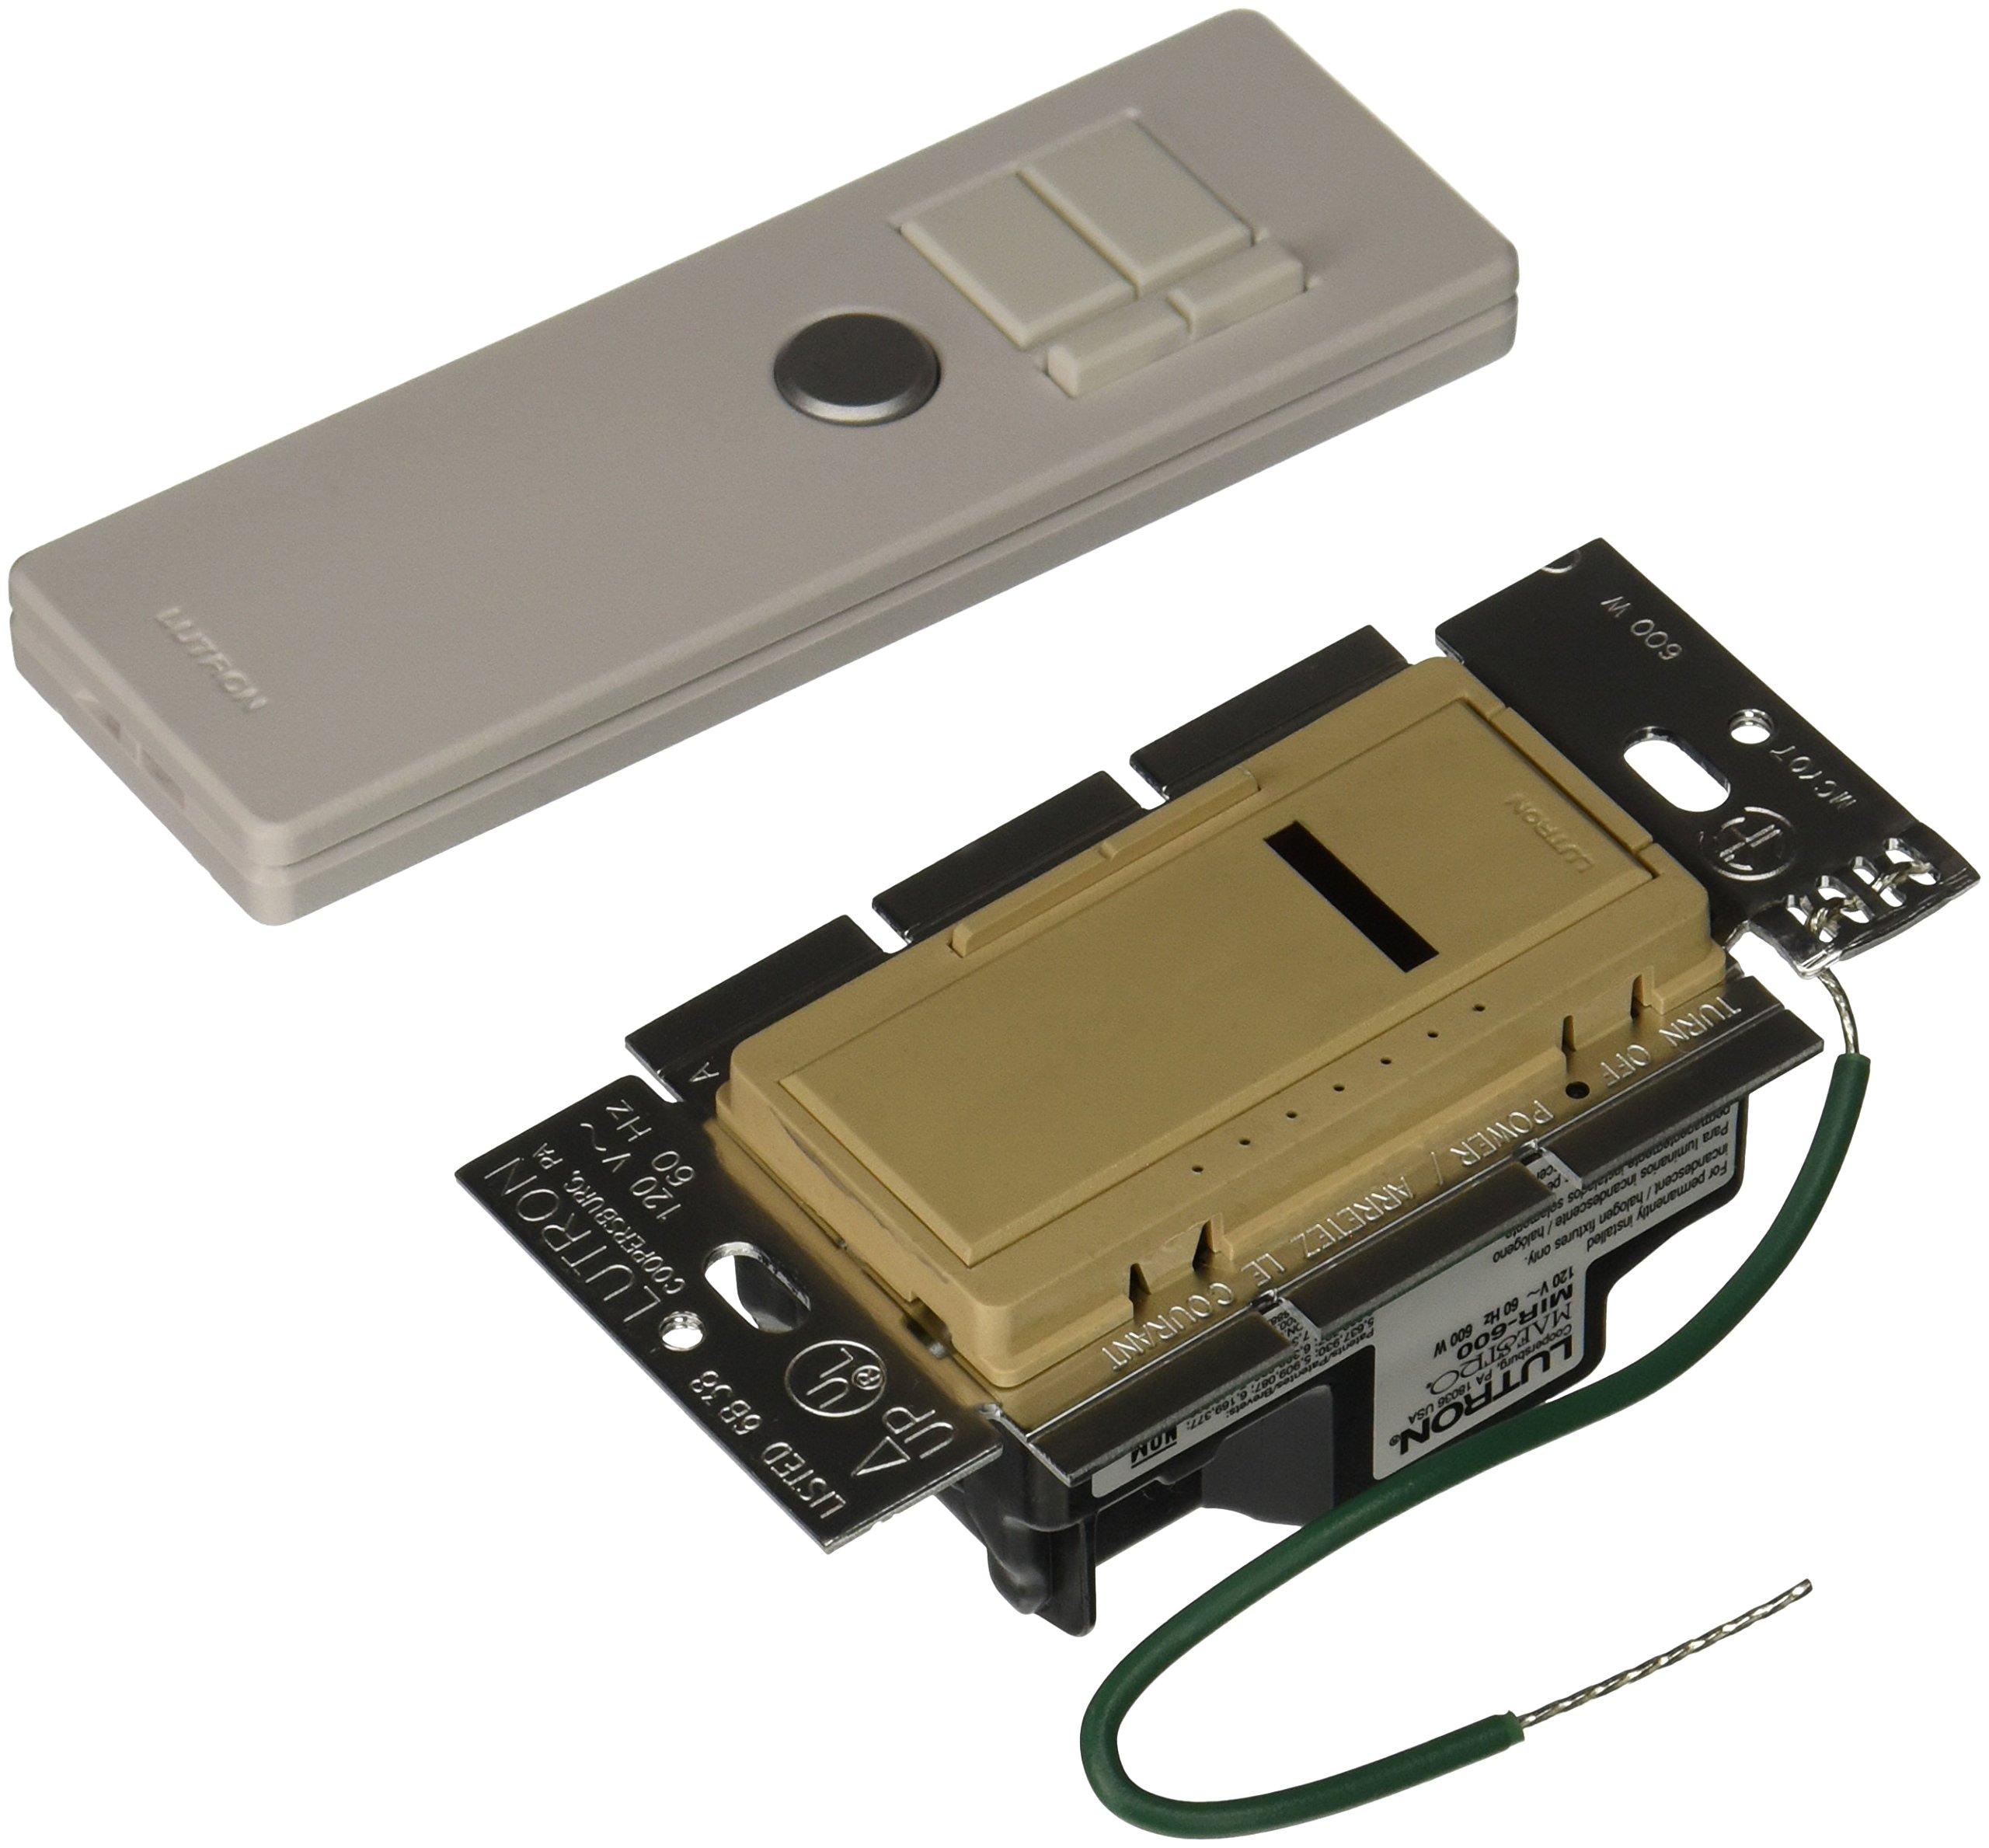 Lutron MIR-600T-DS Maestro IR 600-Watt Single-Pole Dimmer with IR Remote Control, Desert Stone